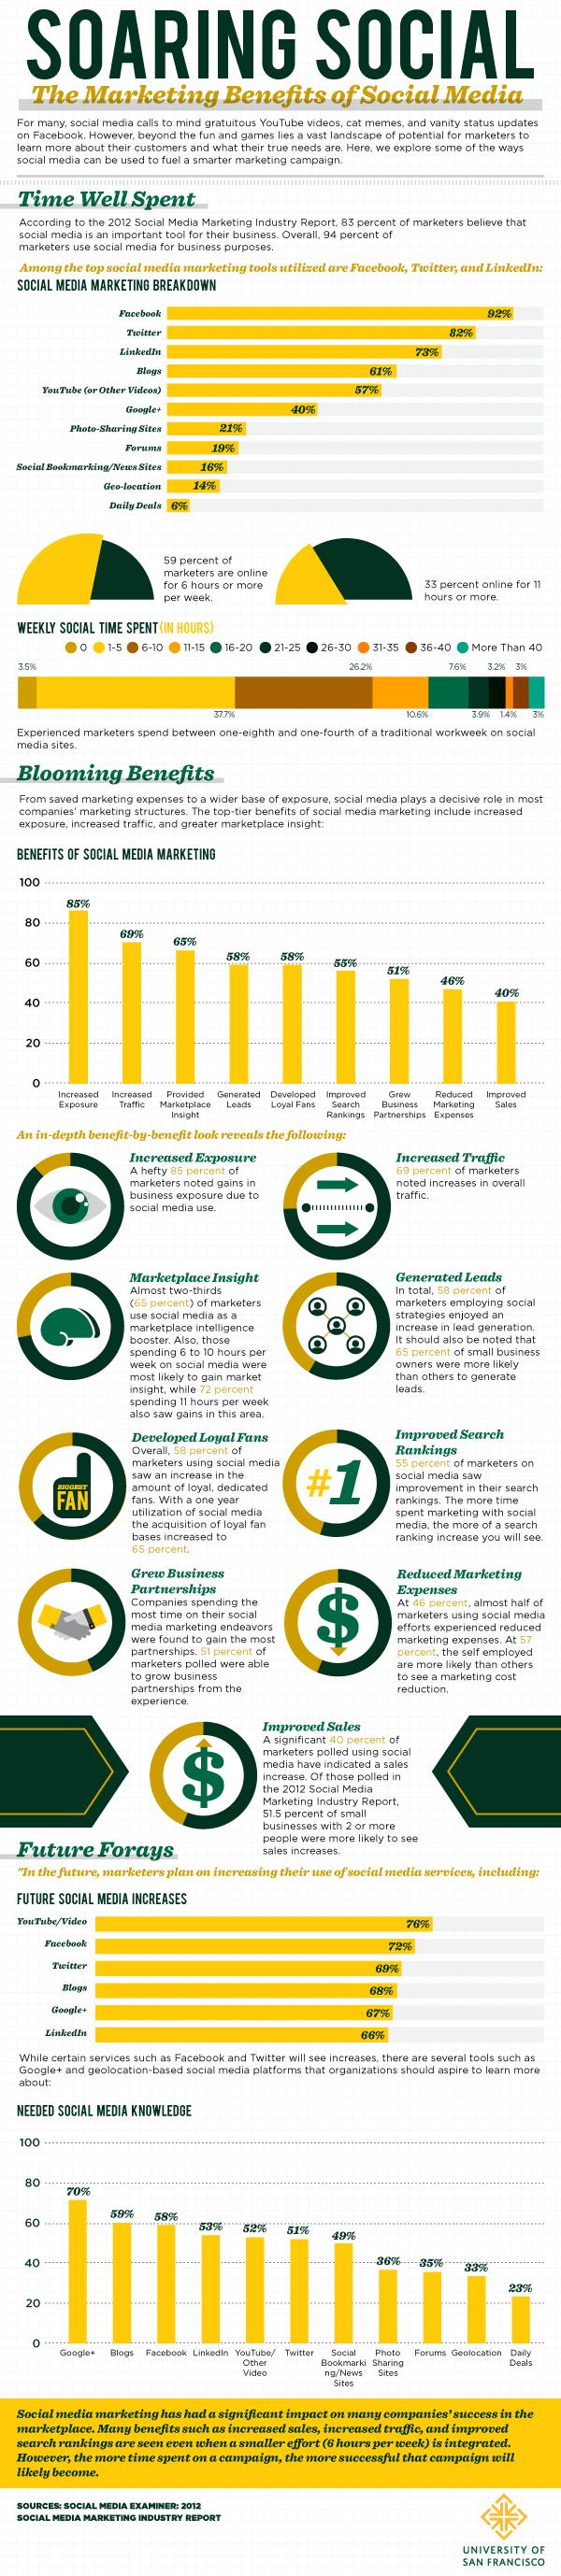 Soaring social: The marketing benefits of social media [infographic]